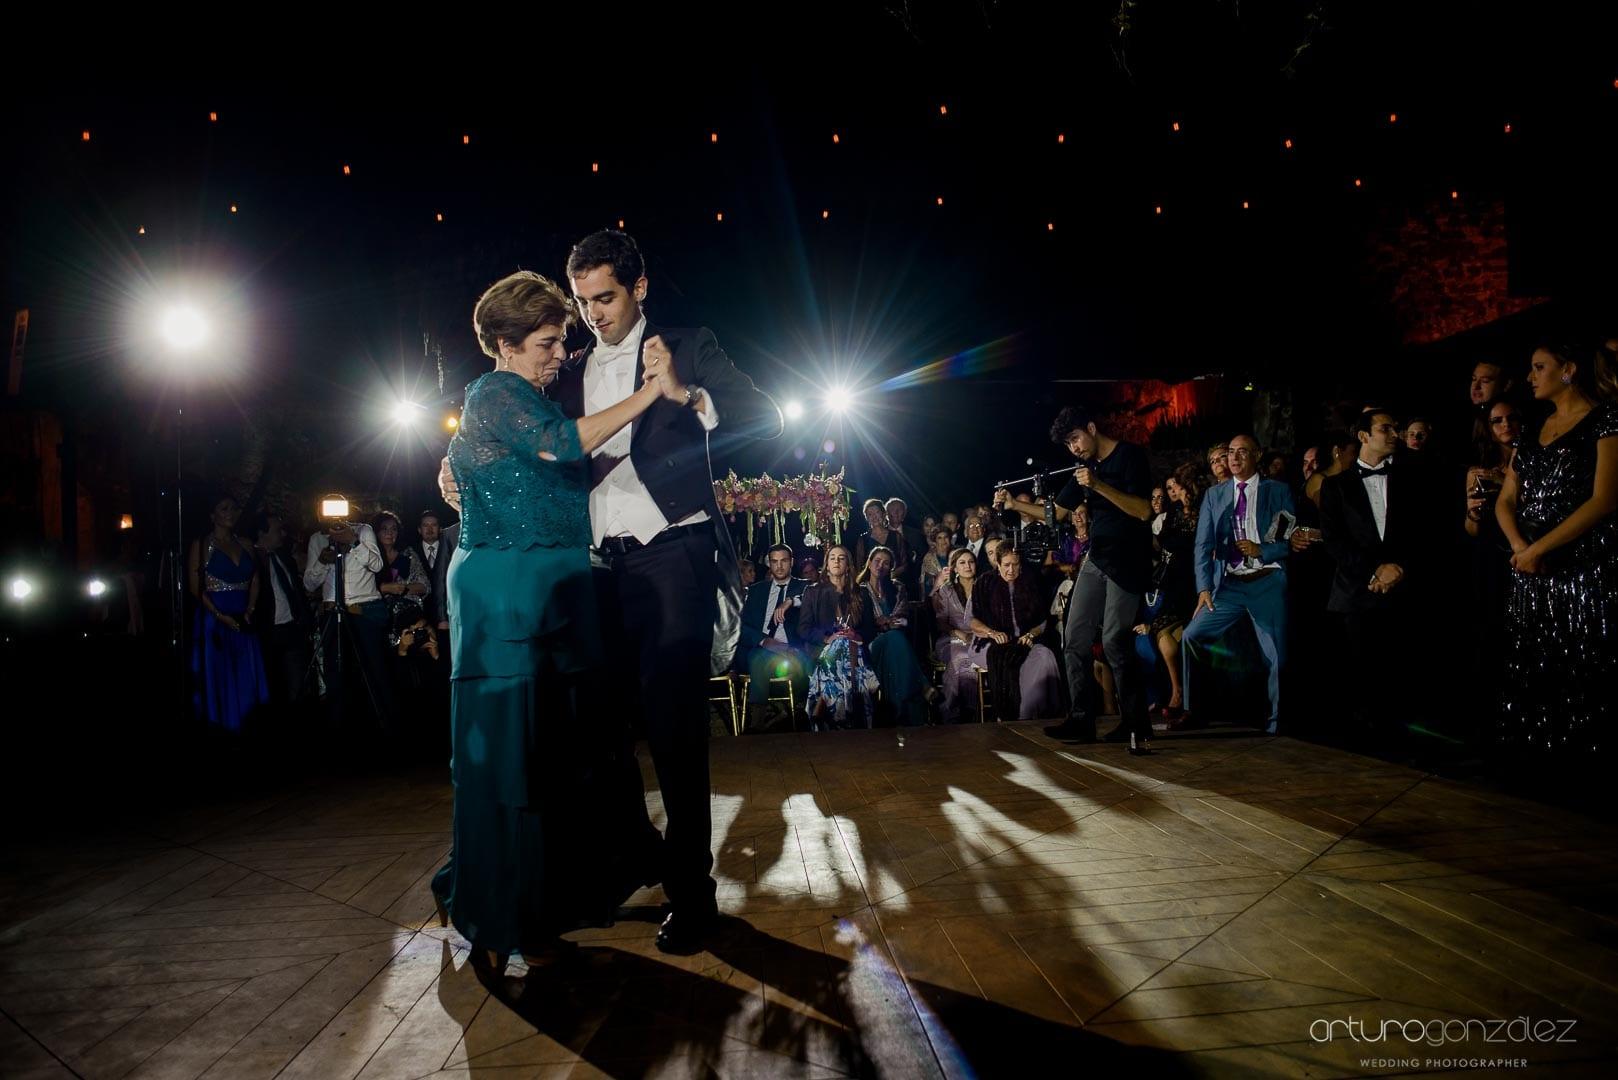 fotografo-de-bodas-en-guanajuato-120